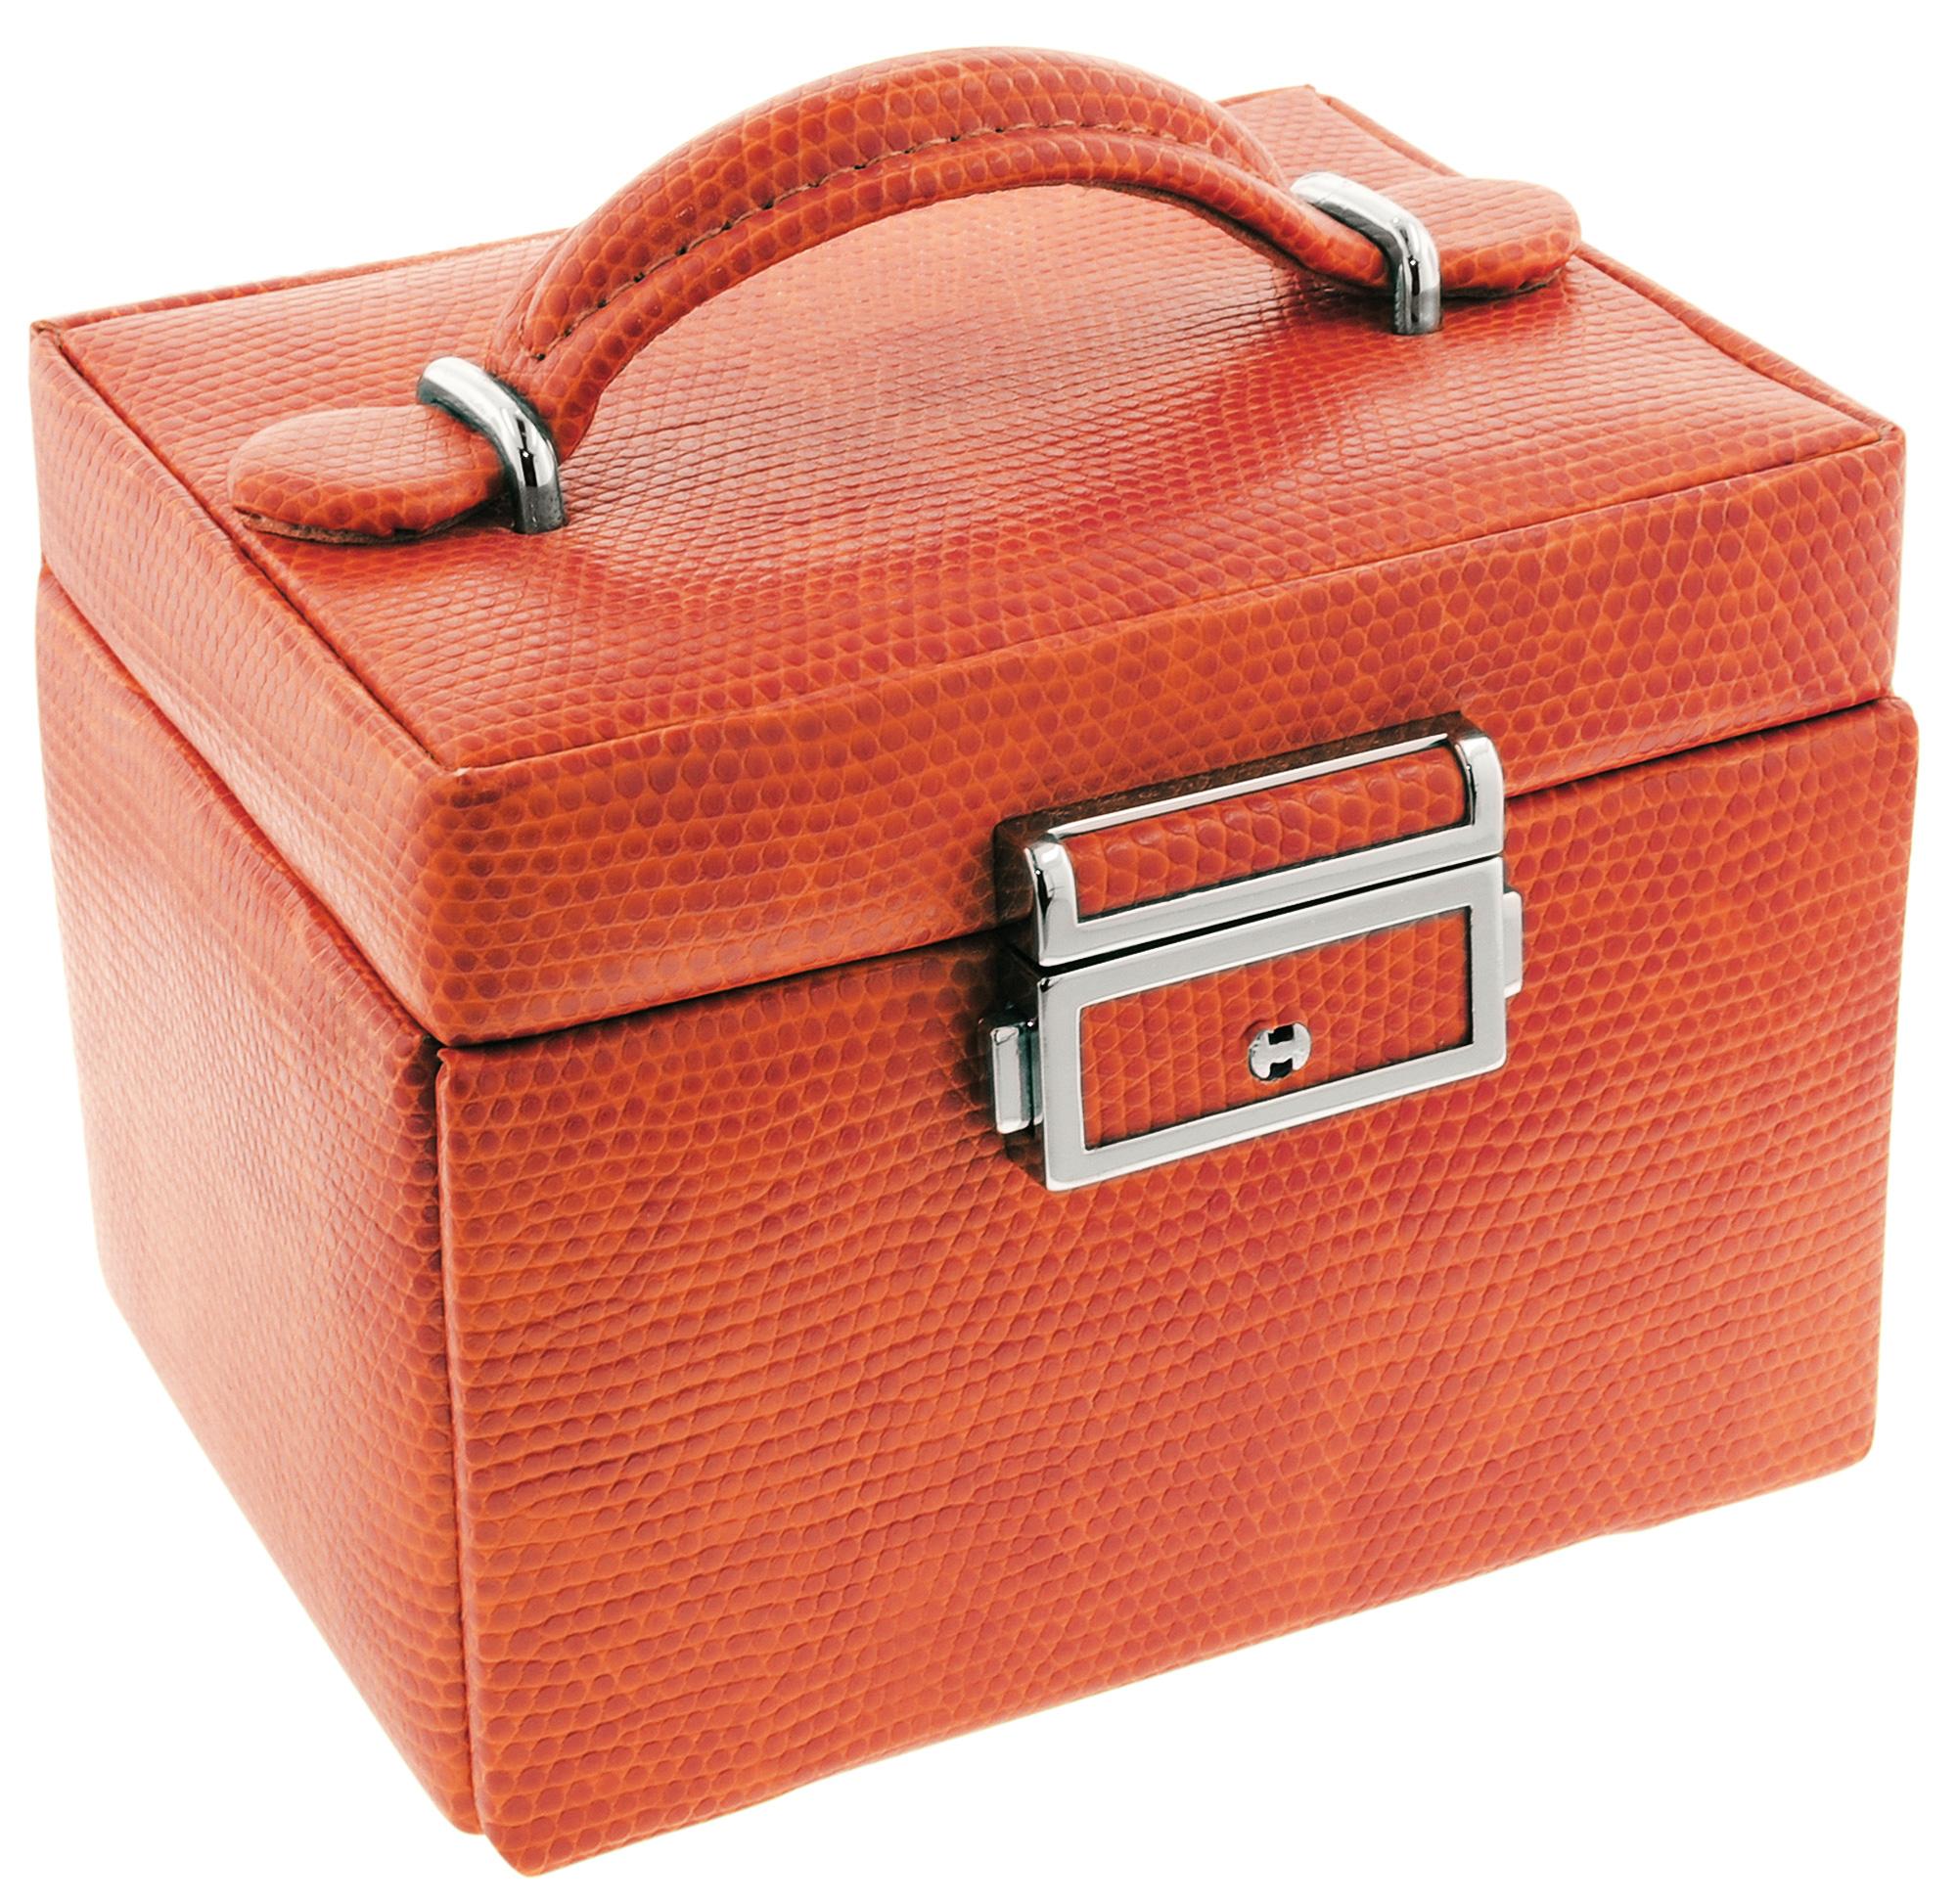 trendor 8050-58 Schmuckkästchen Orange